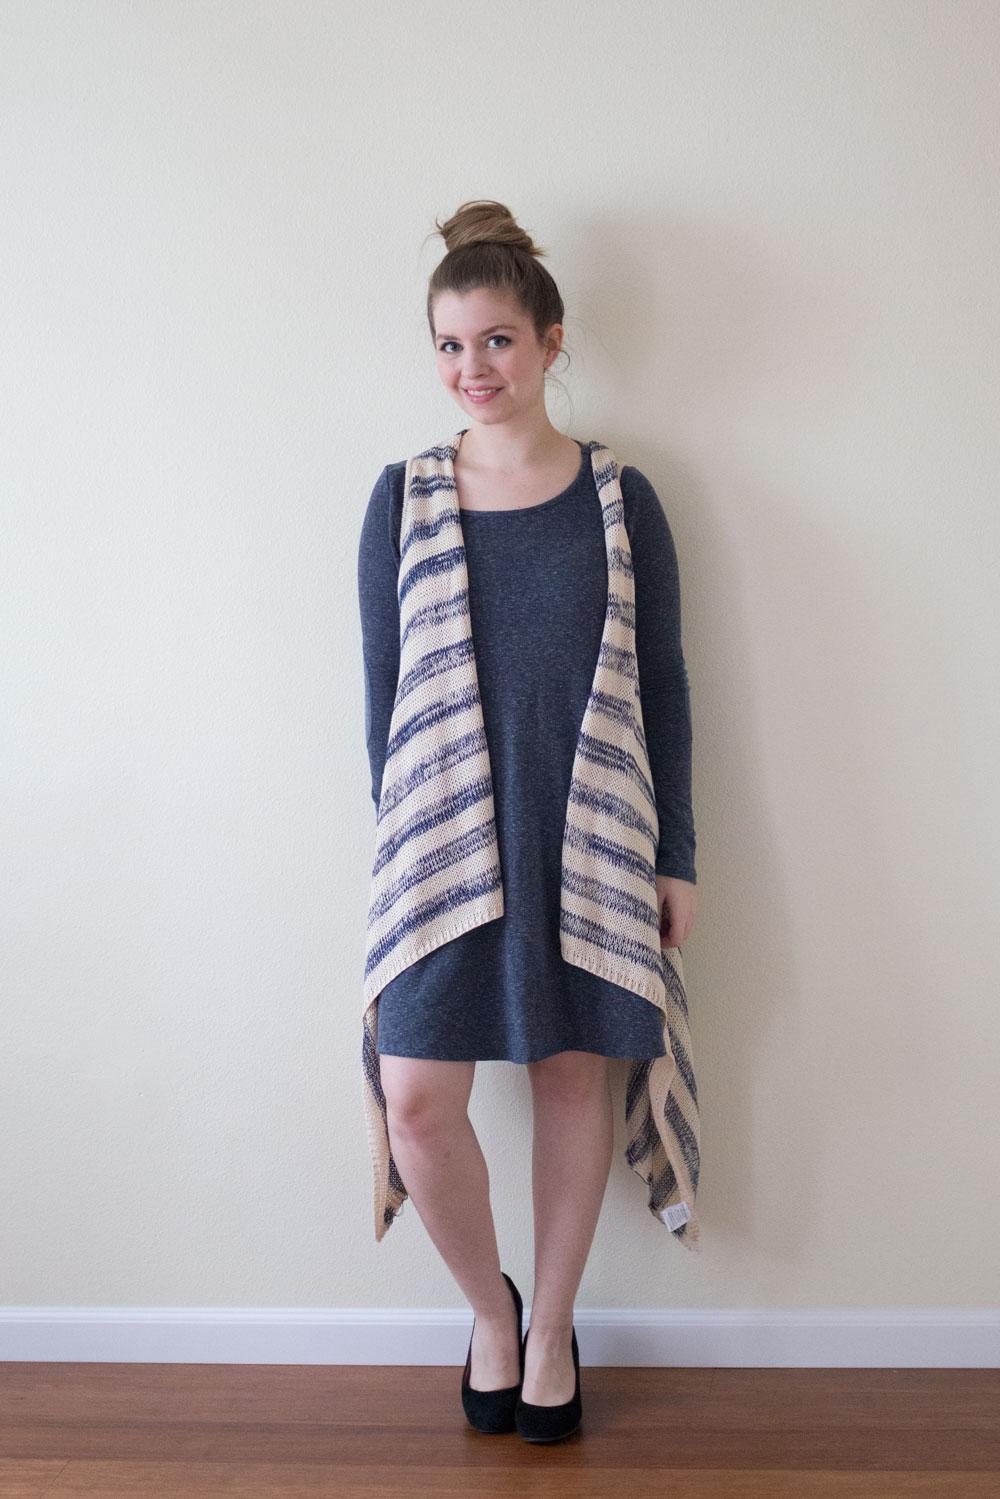 Golden Tote March 2015: Paper Crane Boho Stripe Knit Vest / hellorigby seattle fashion blog